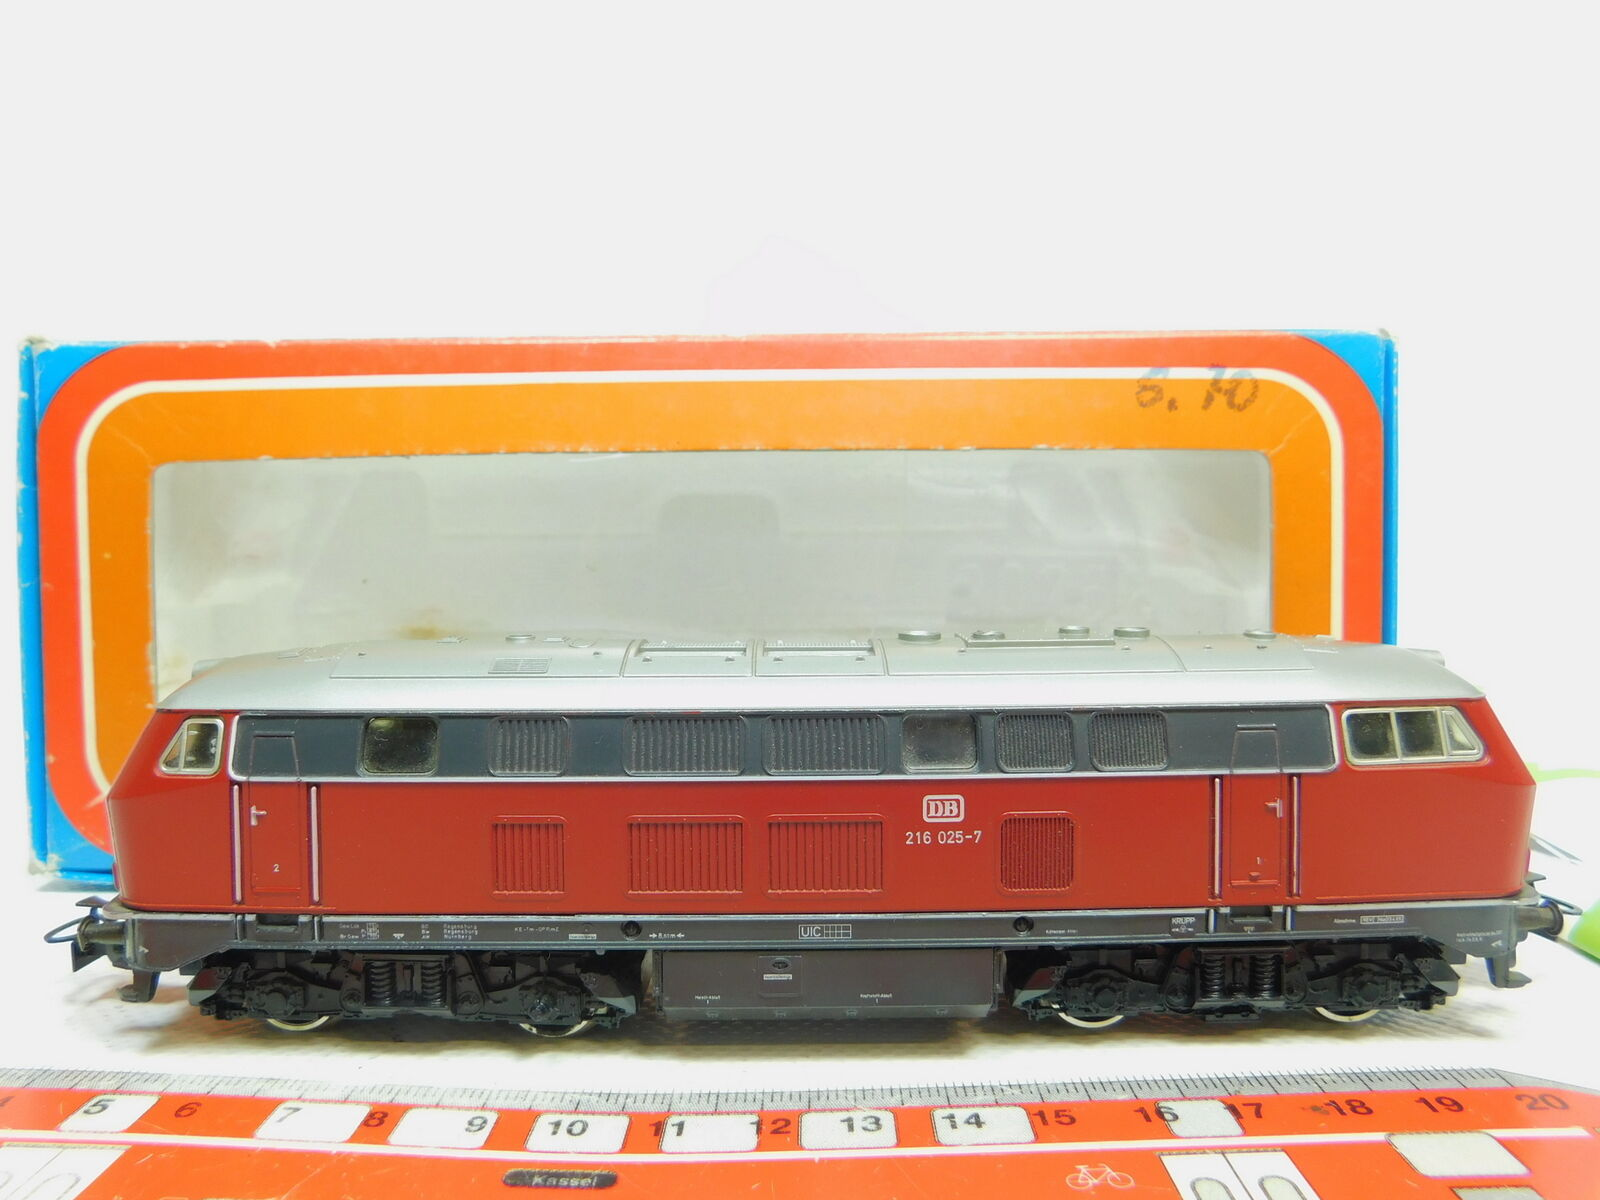 Bo69-1 märklin h0 ac 3075 diesel locomotive diesellokomotive 216 025-7 db,